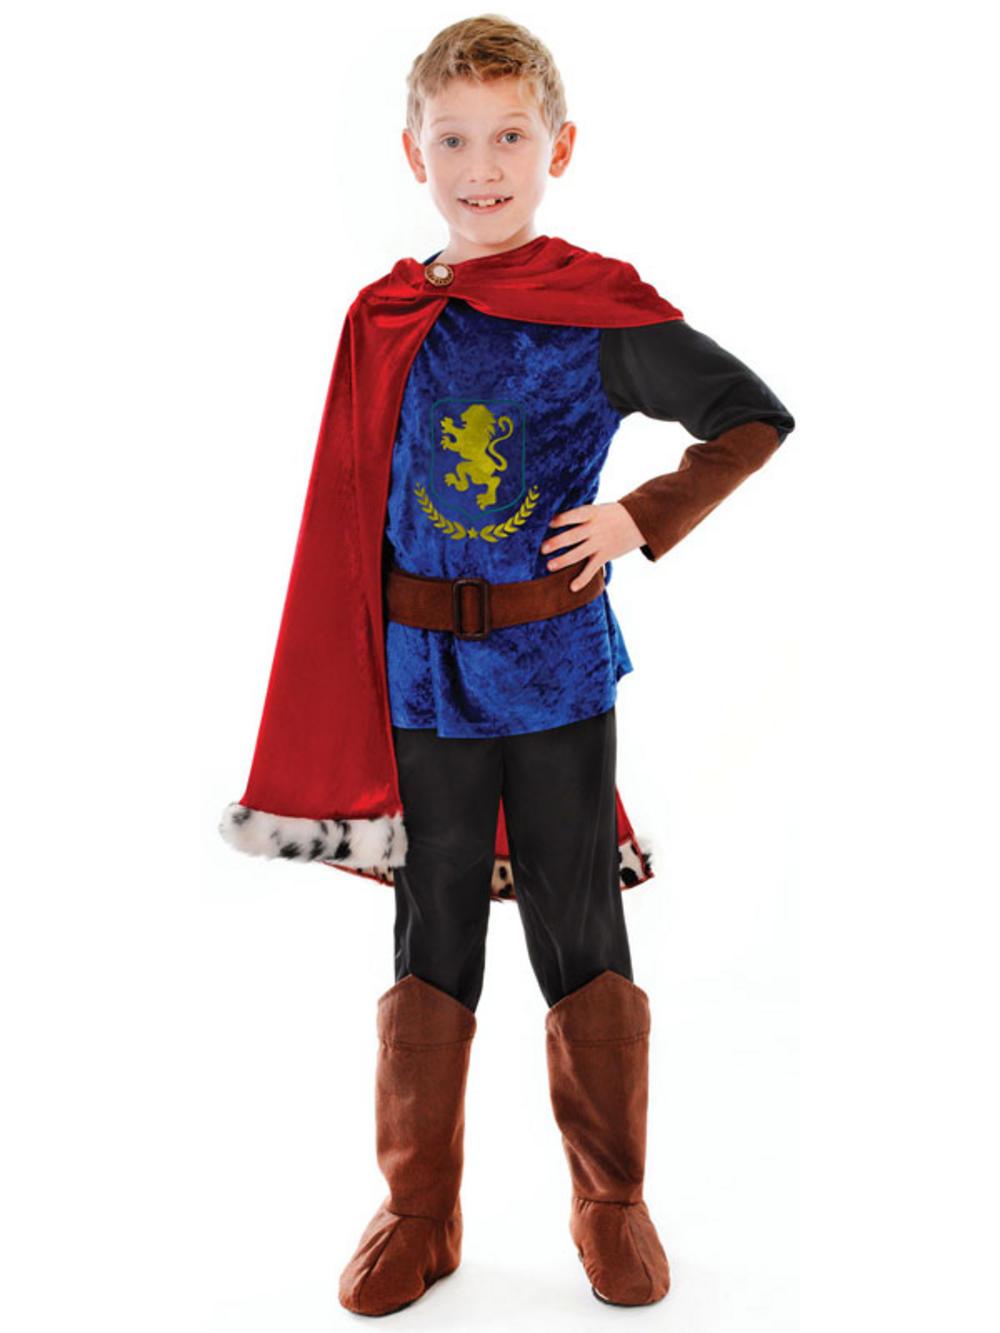 Storybook & Fairytale Costumes - HalloweenCostumes.com